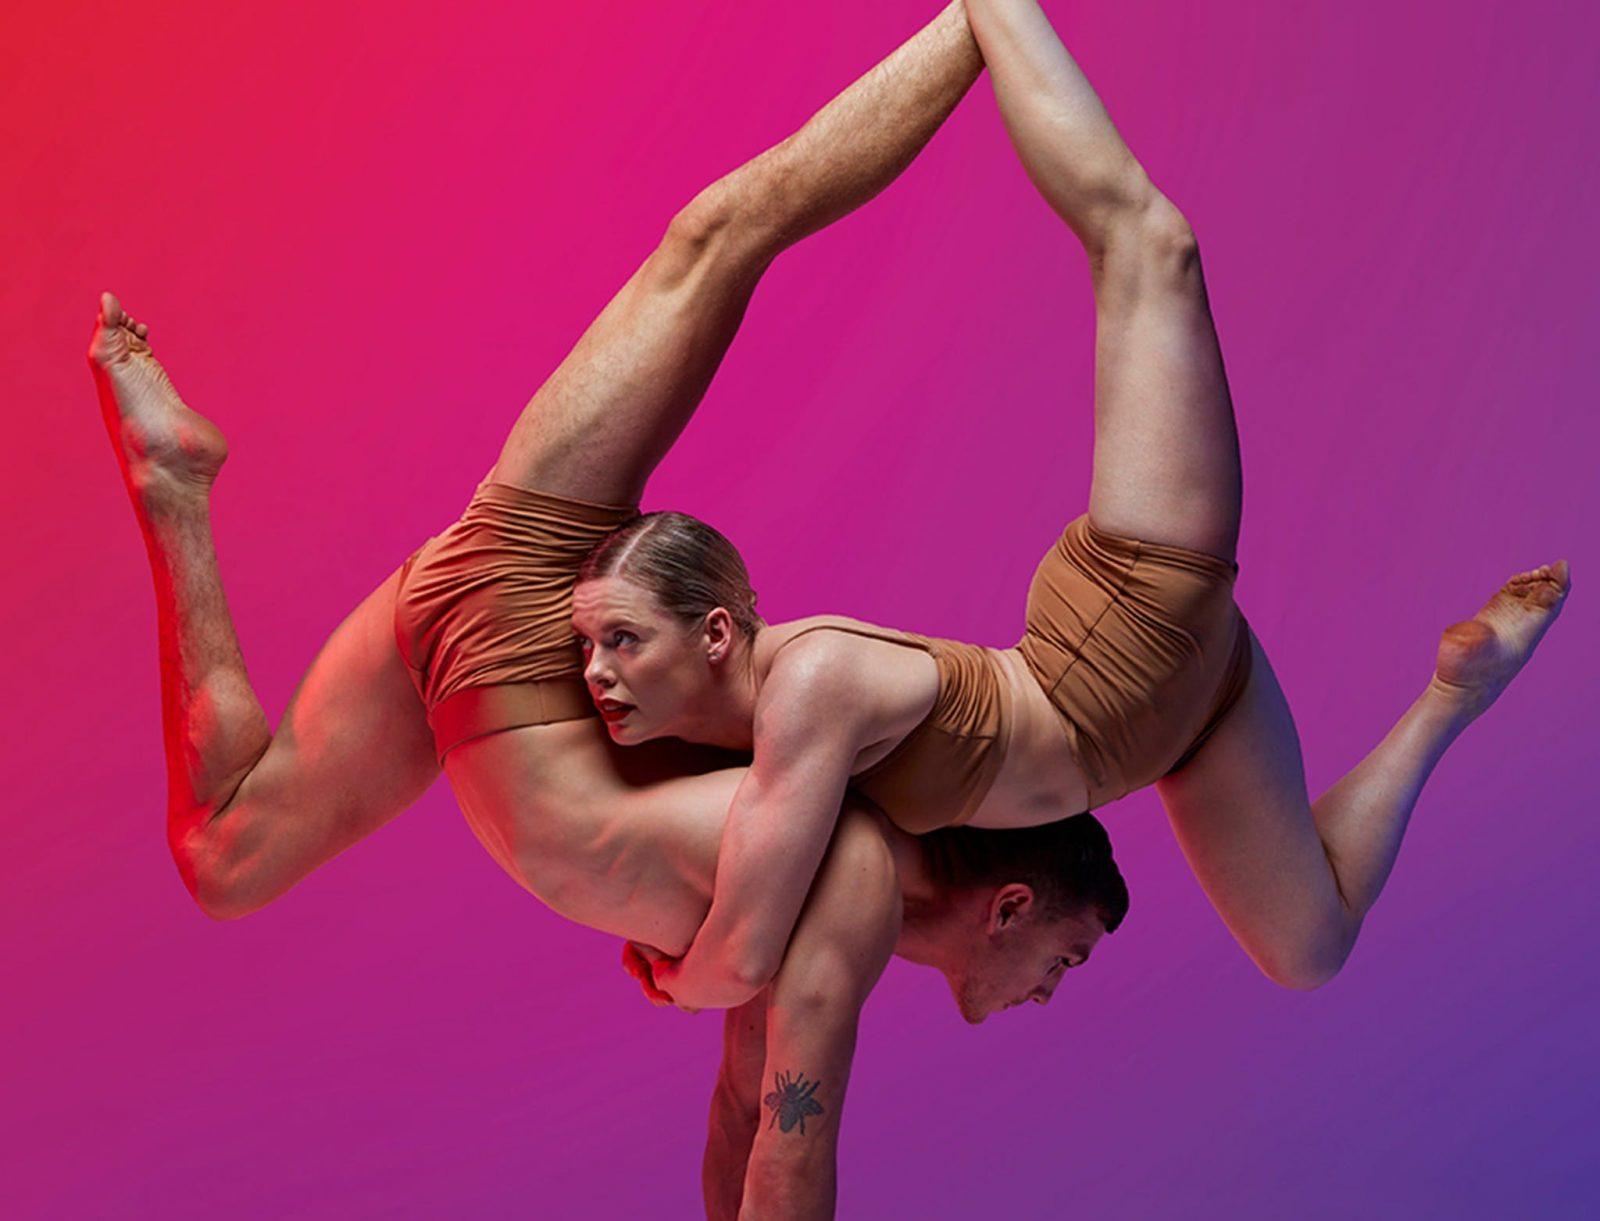 Man and woman acrobats